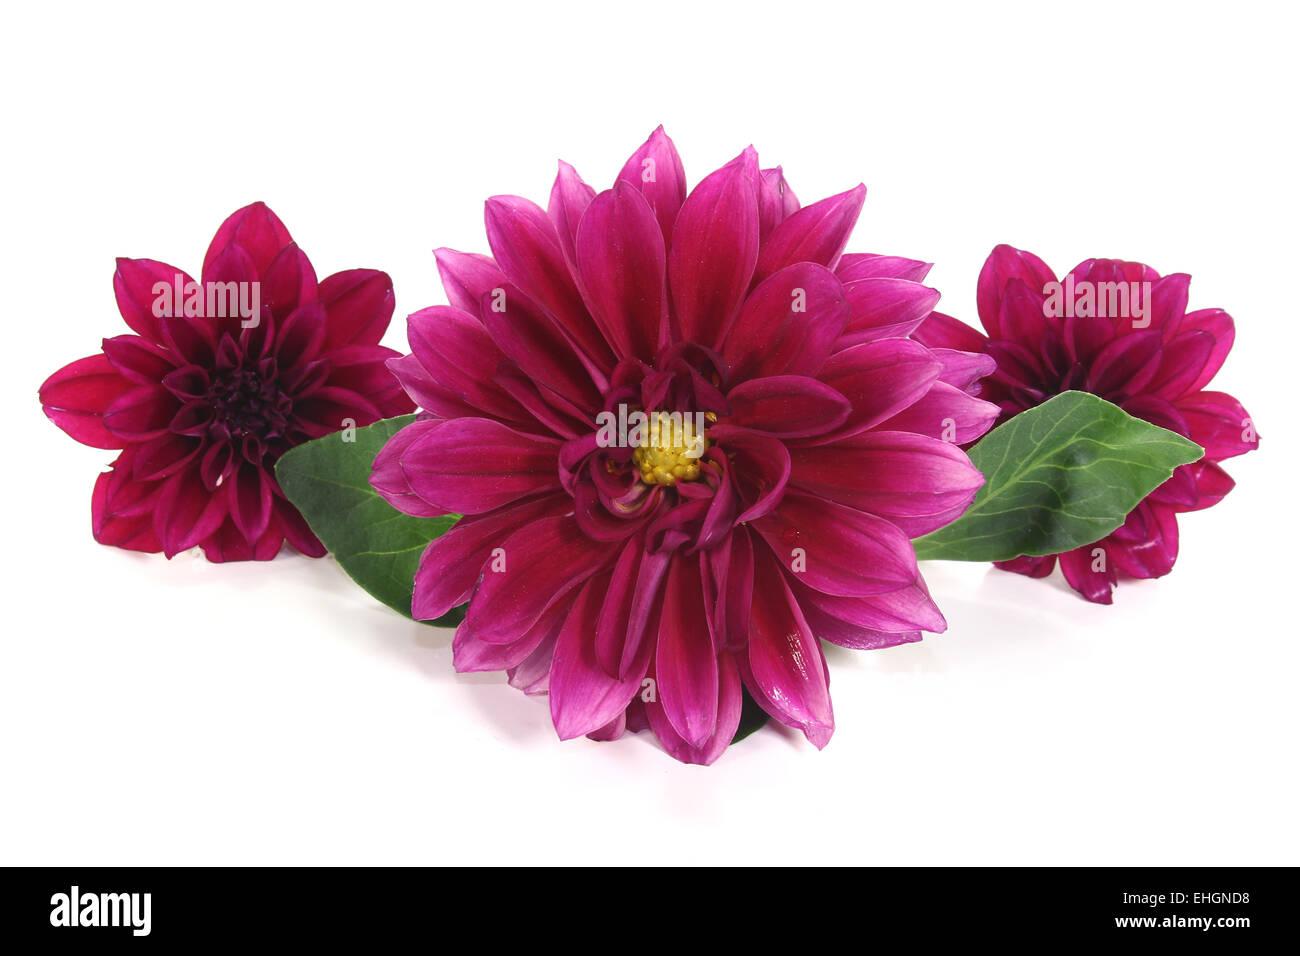 wine-red little dahlia - Stock Image